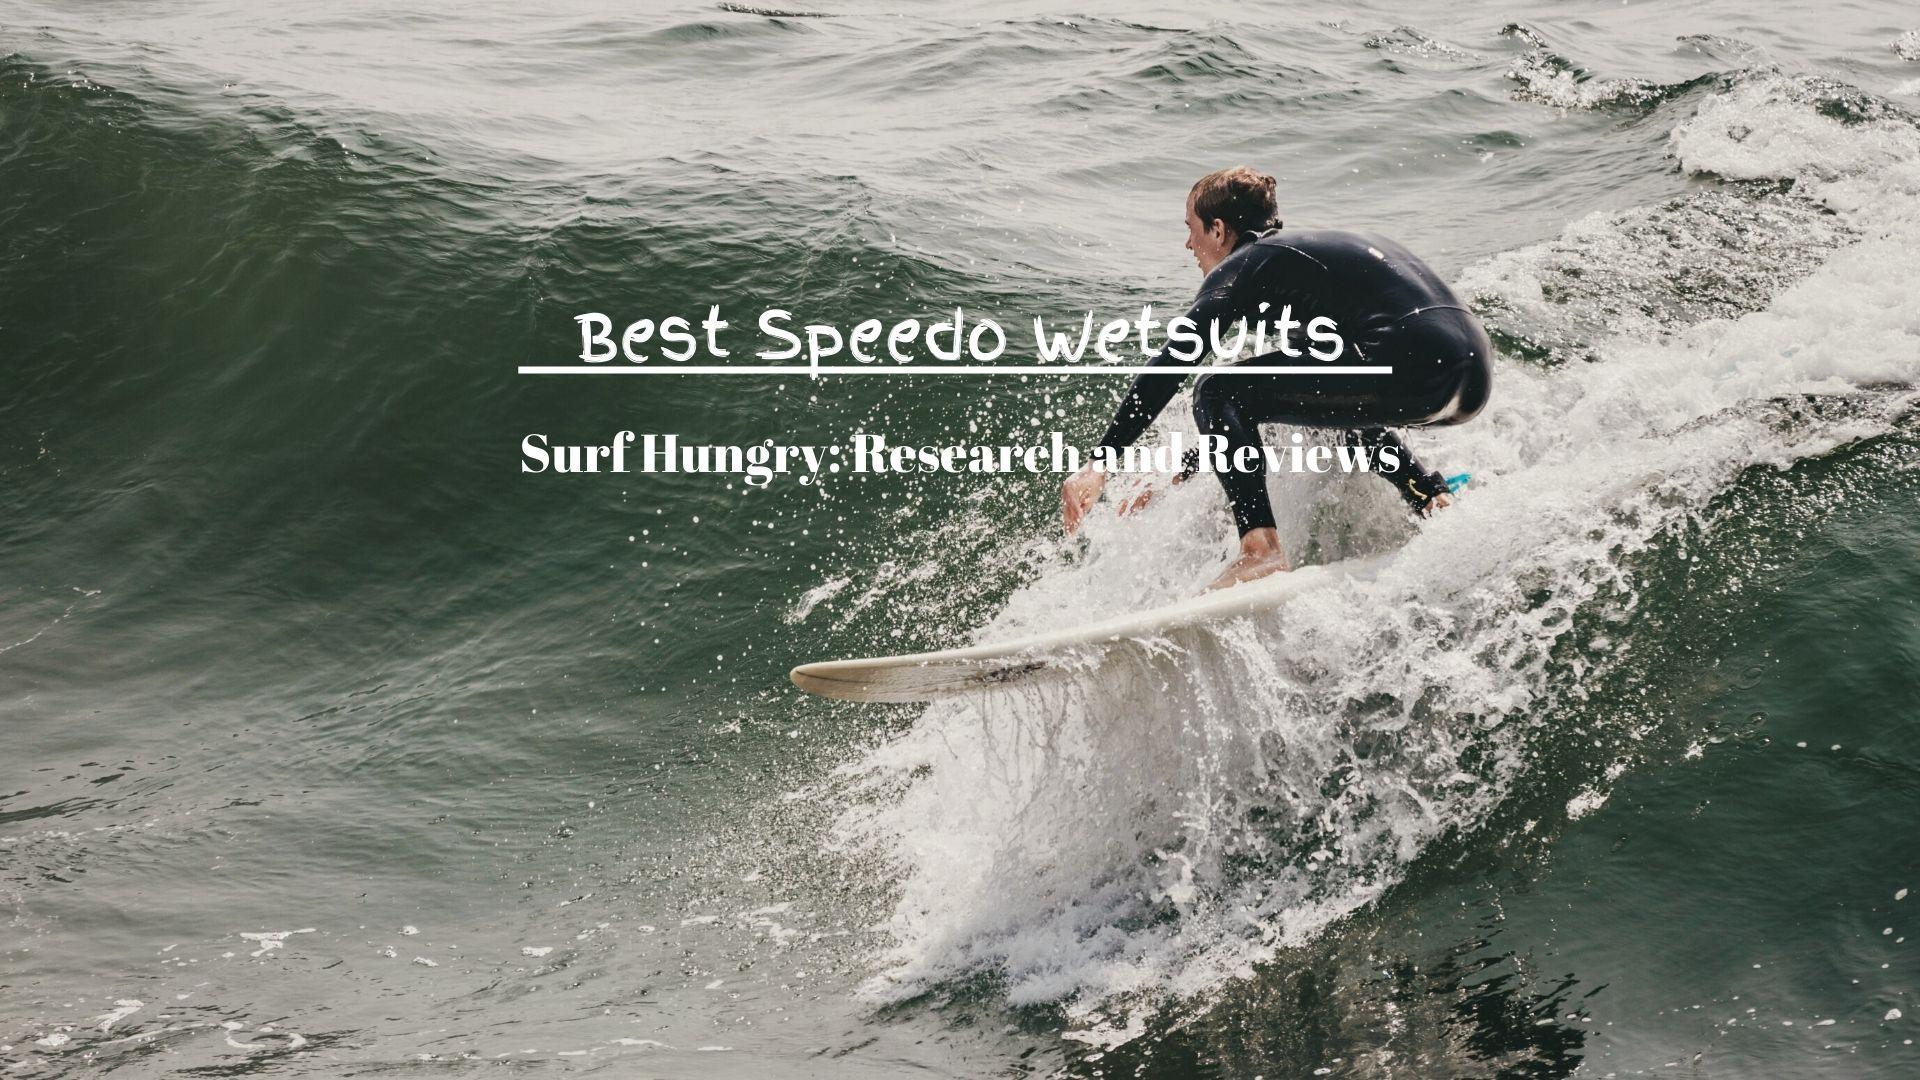 speedo wetsuits review